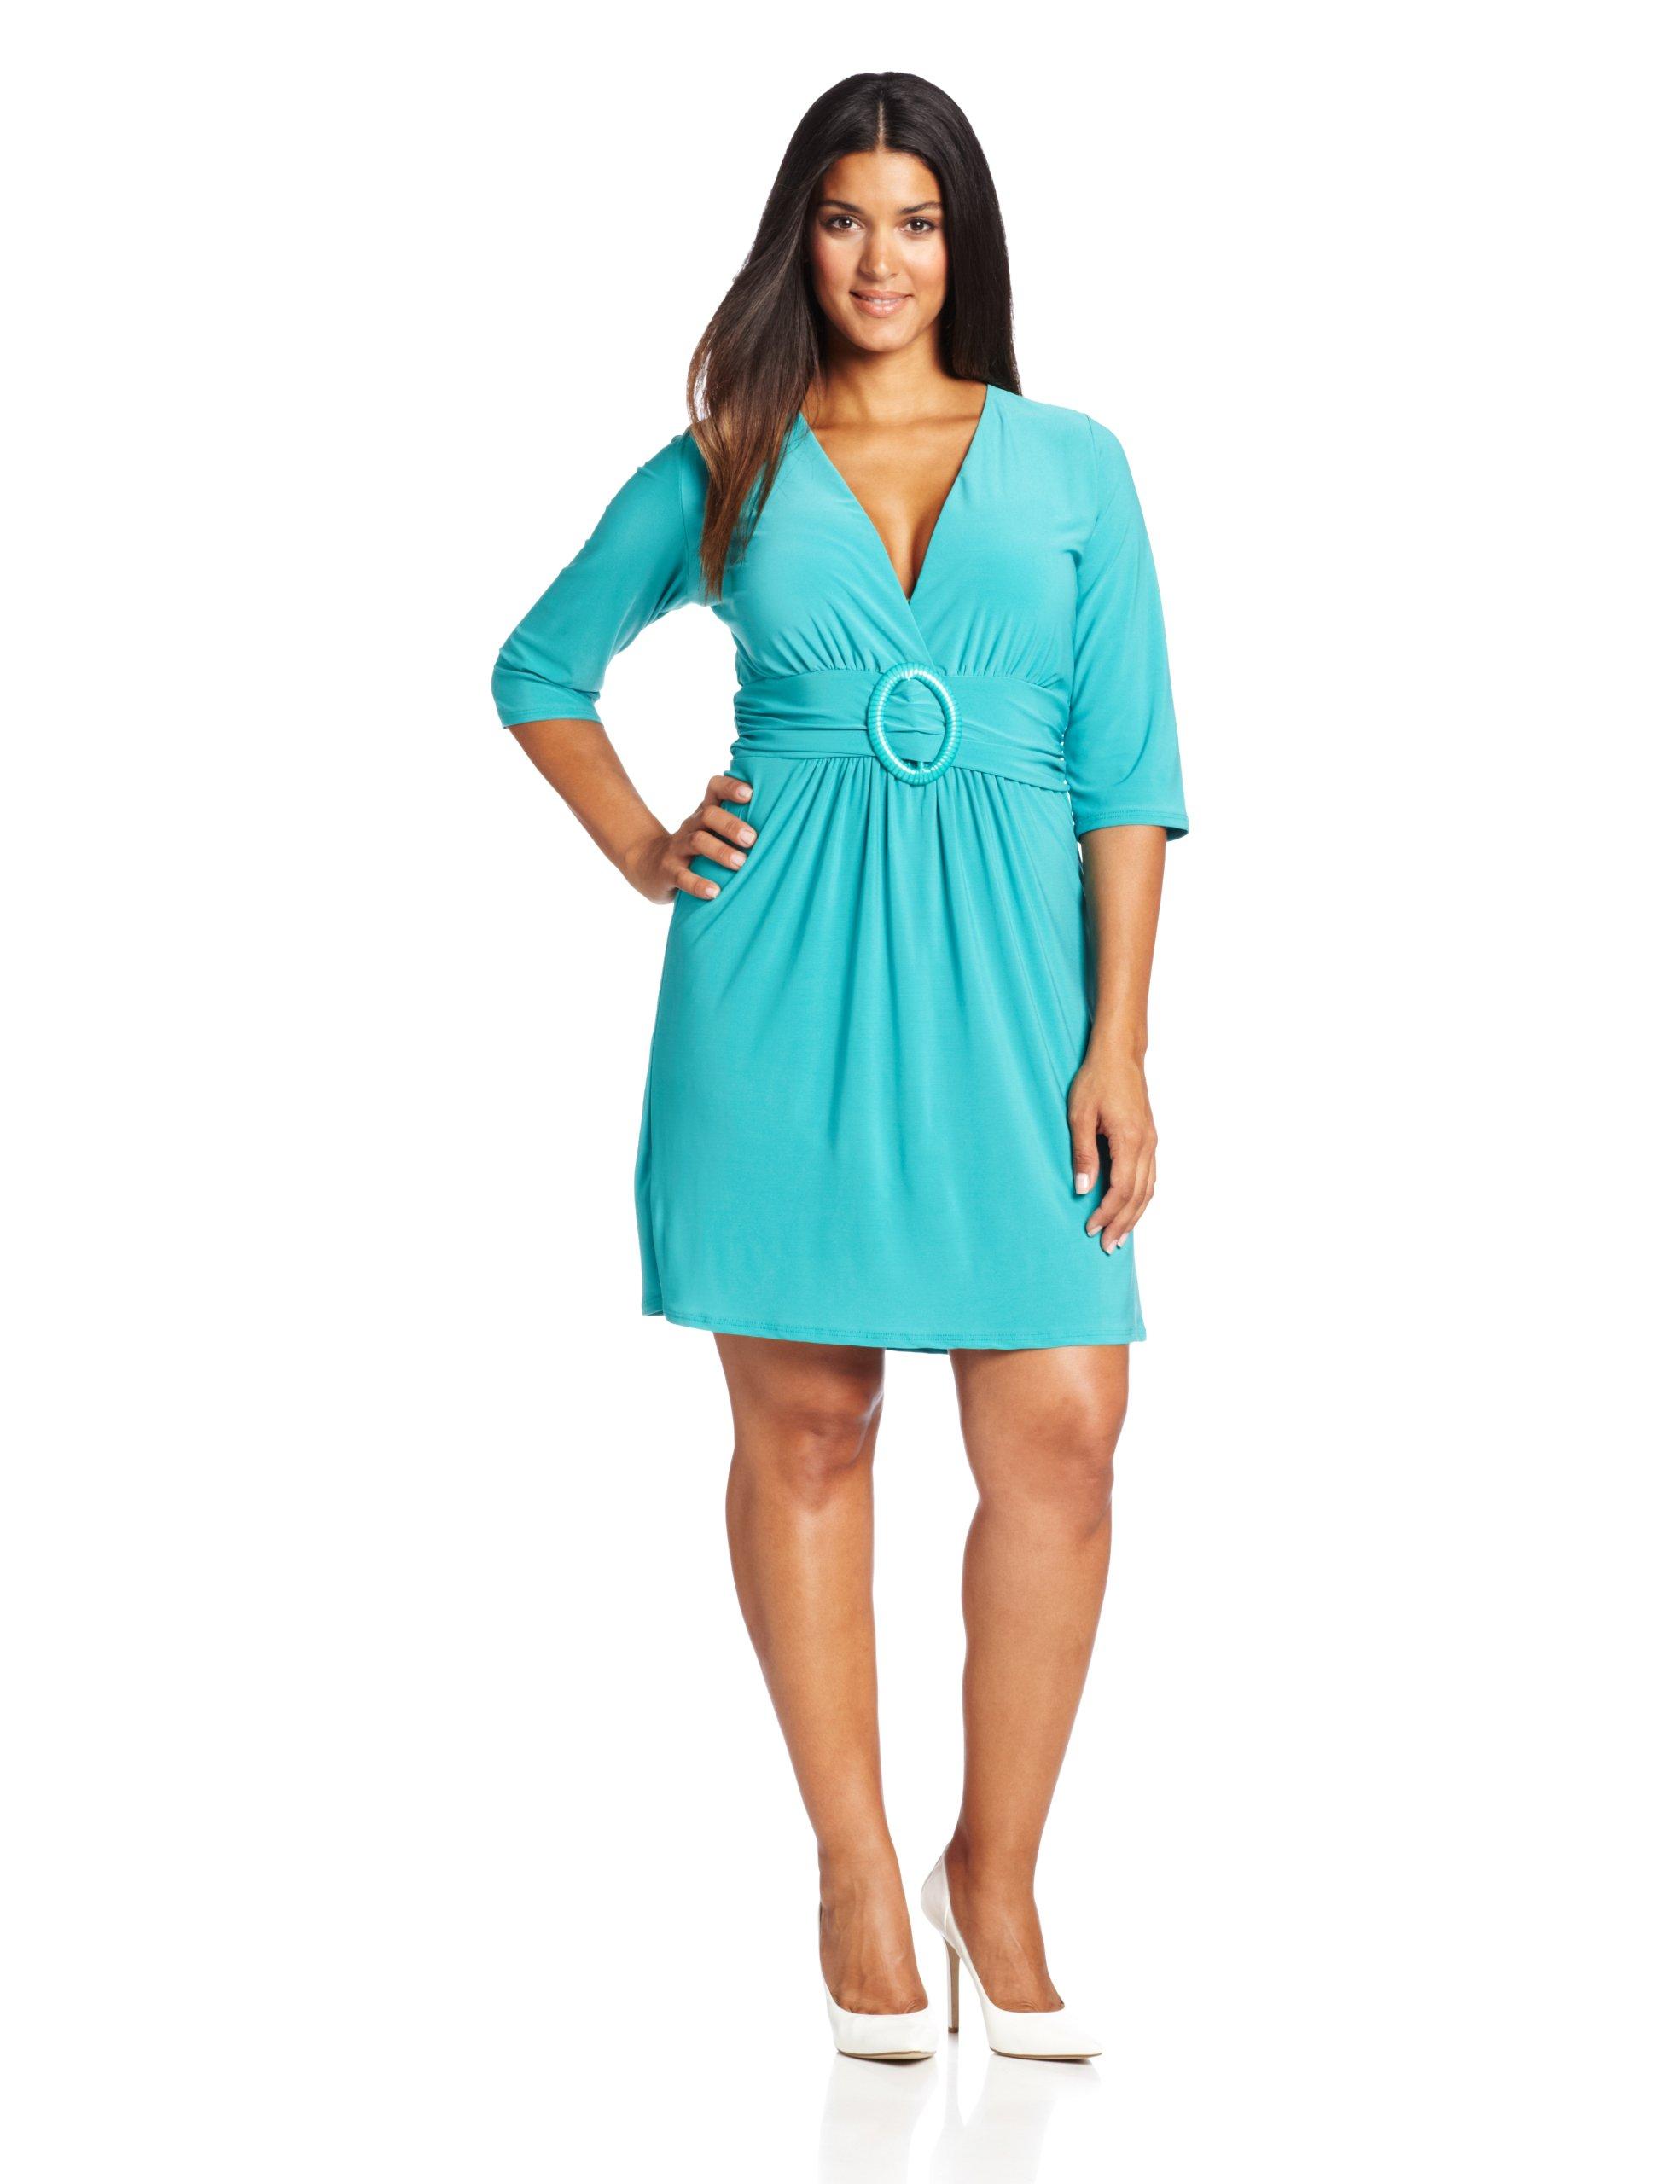 Available at Amazon: Star Vixen Women's Plus-Size Three-Quarter Sleeve Buckle-Detail Dress